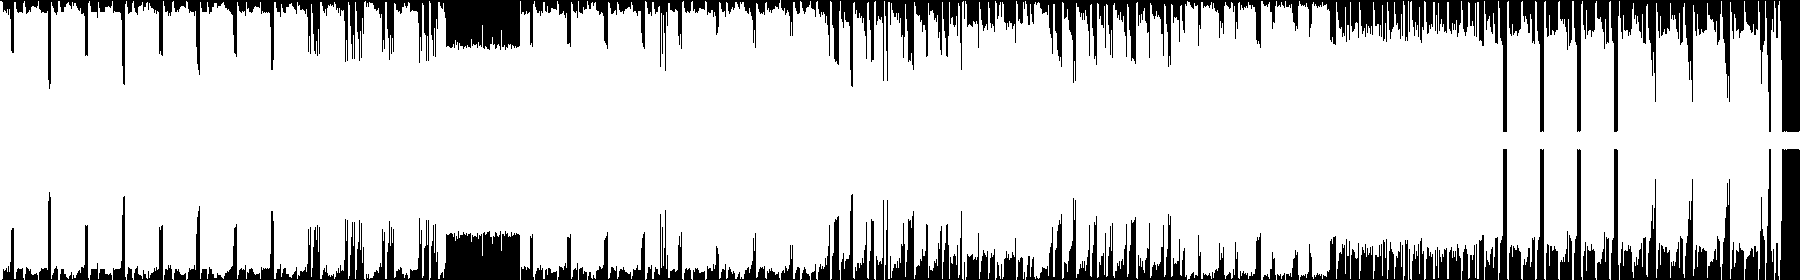 Black audio waveform